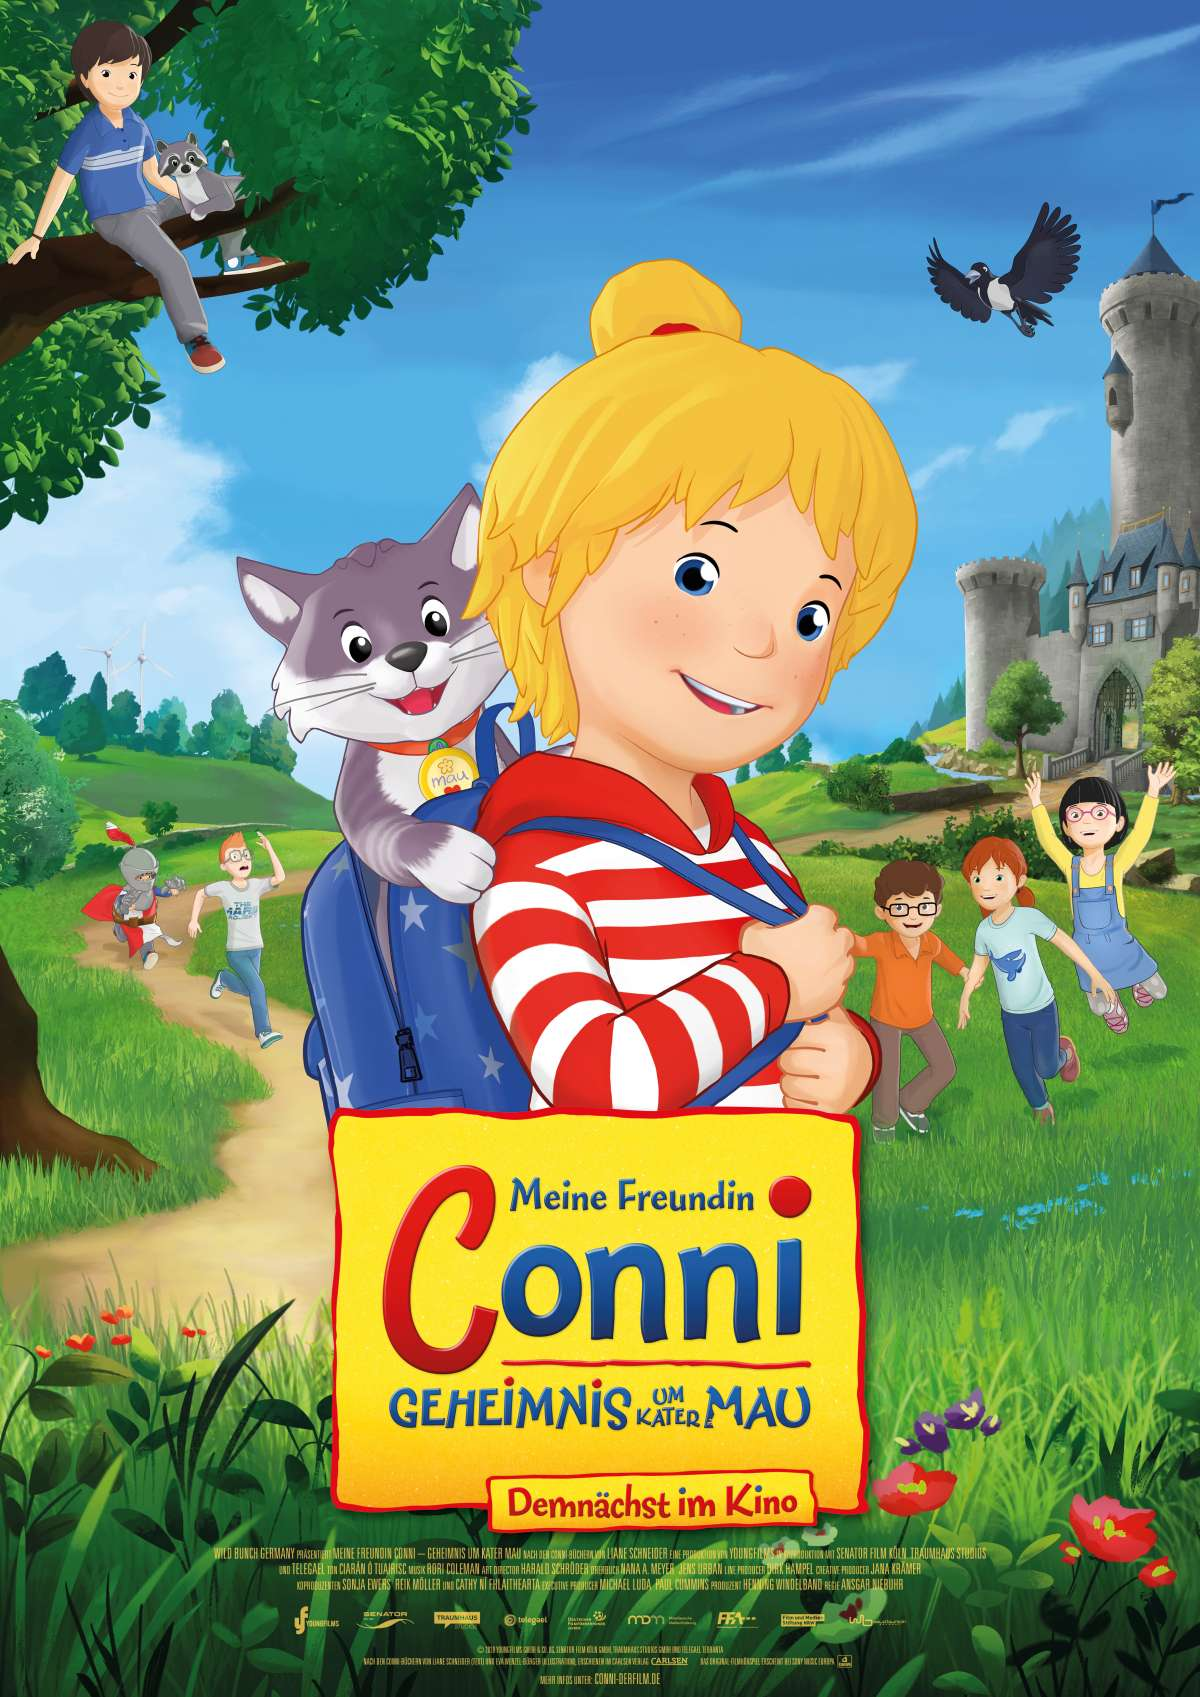 Meine Freundin Conni - Geheimnis um Kater Mau - Cine-Royal  - Fritzlar